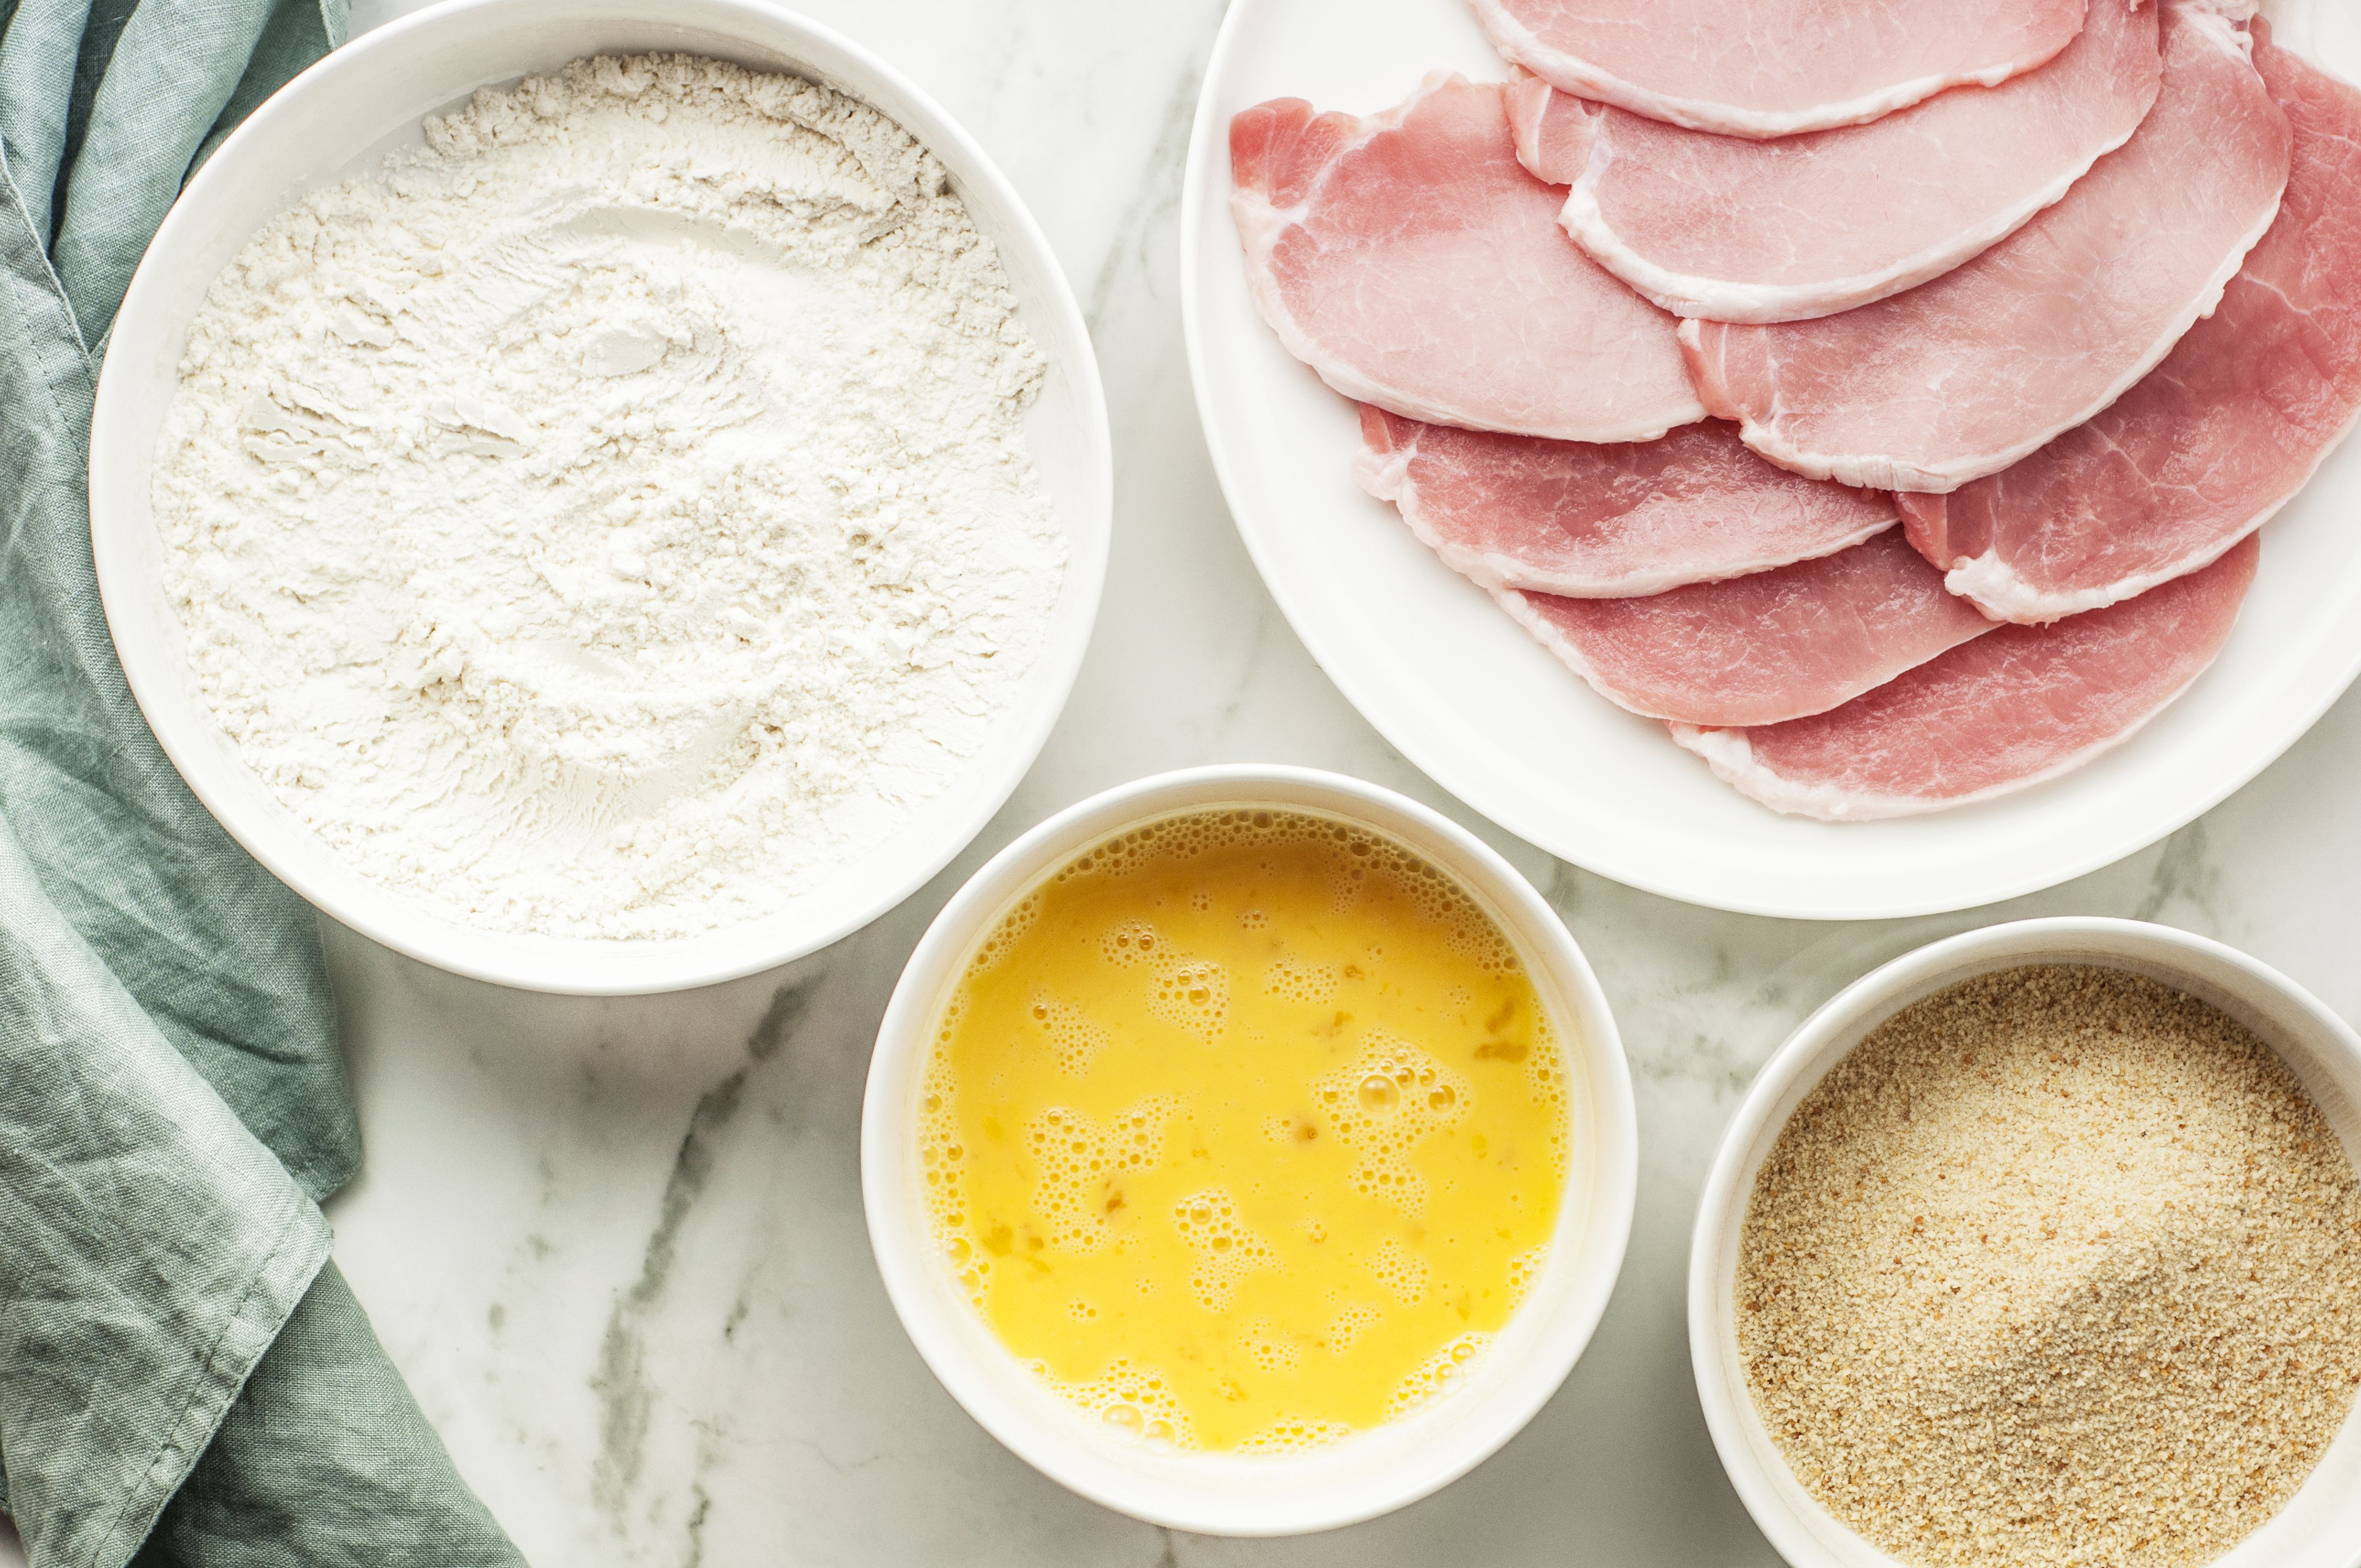 flour, salt, bread crumbs with cutlets